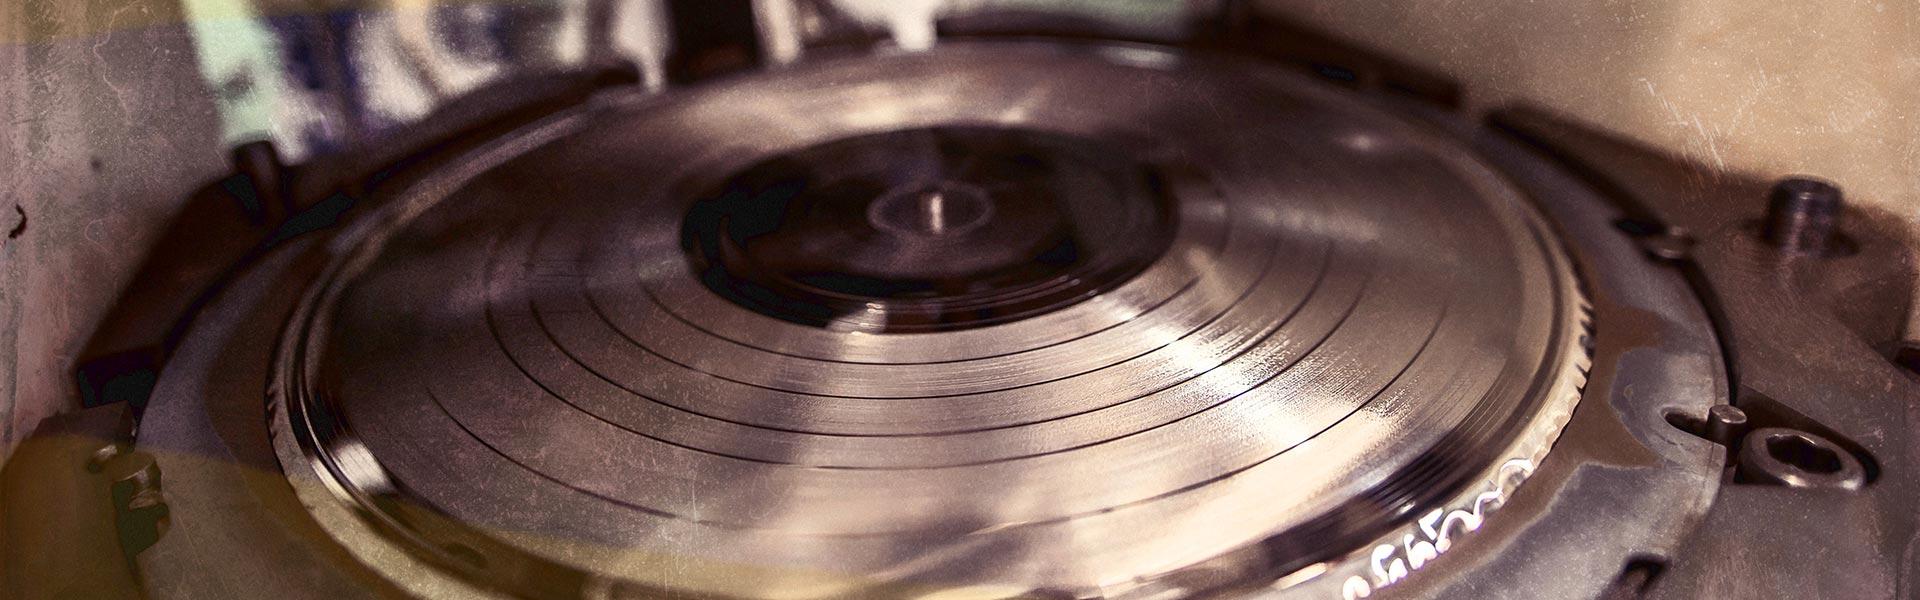 Manual Vinyl Pressing machine